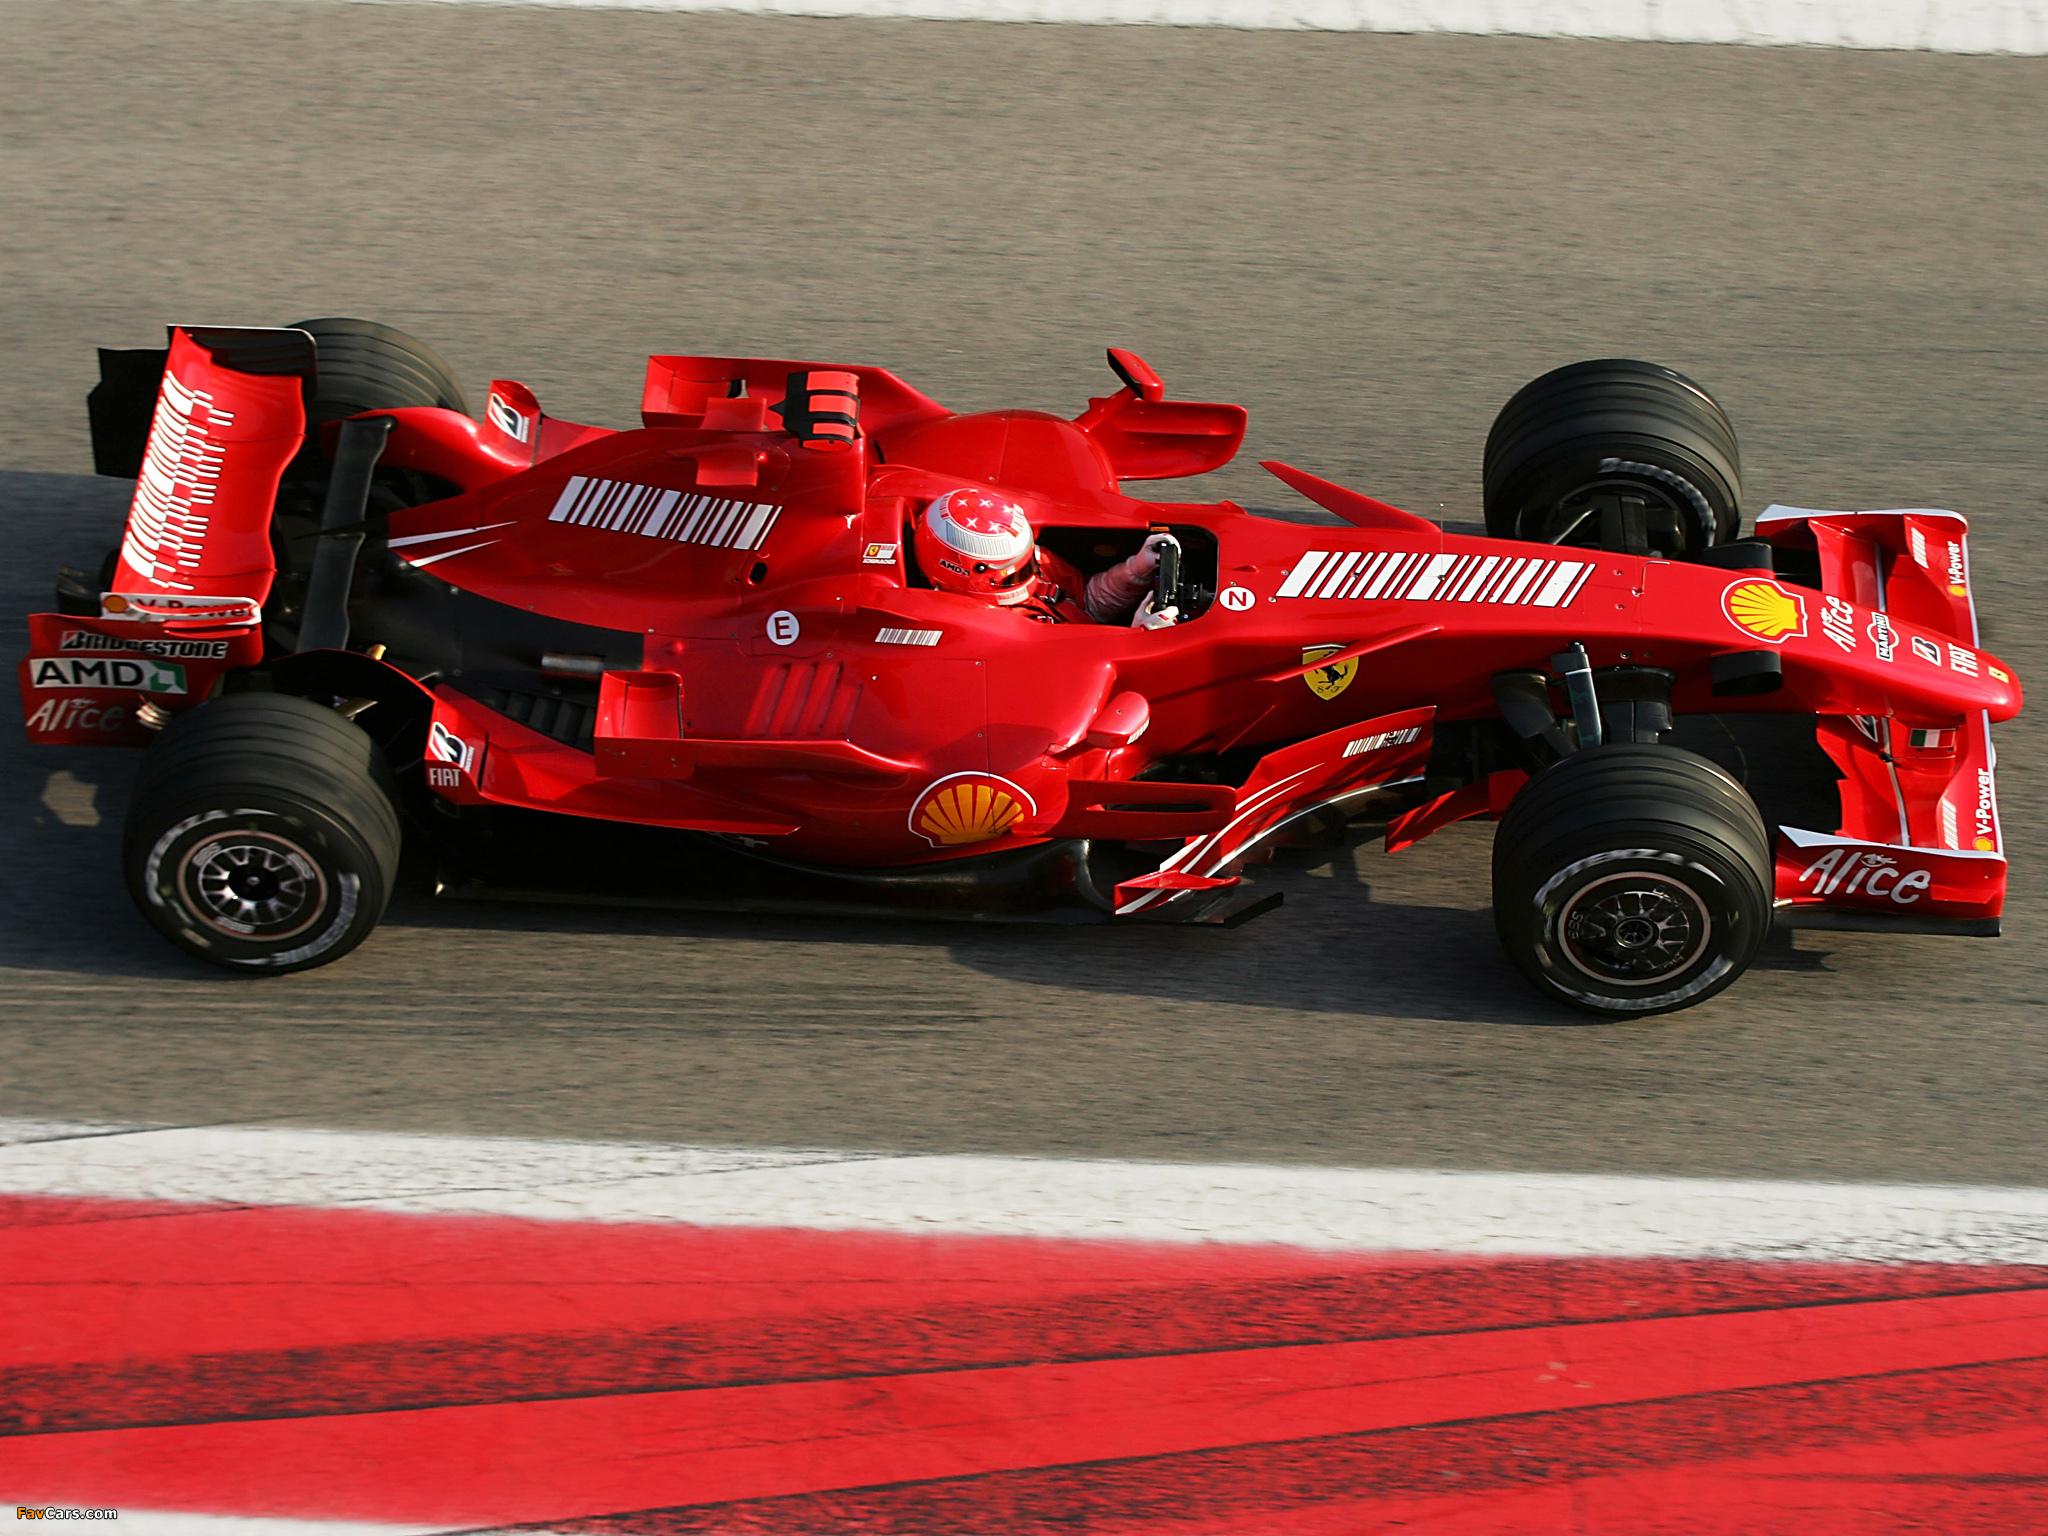 F1 Grand Prix Tours